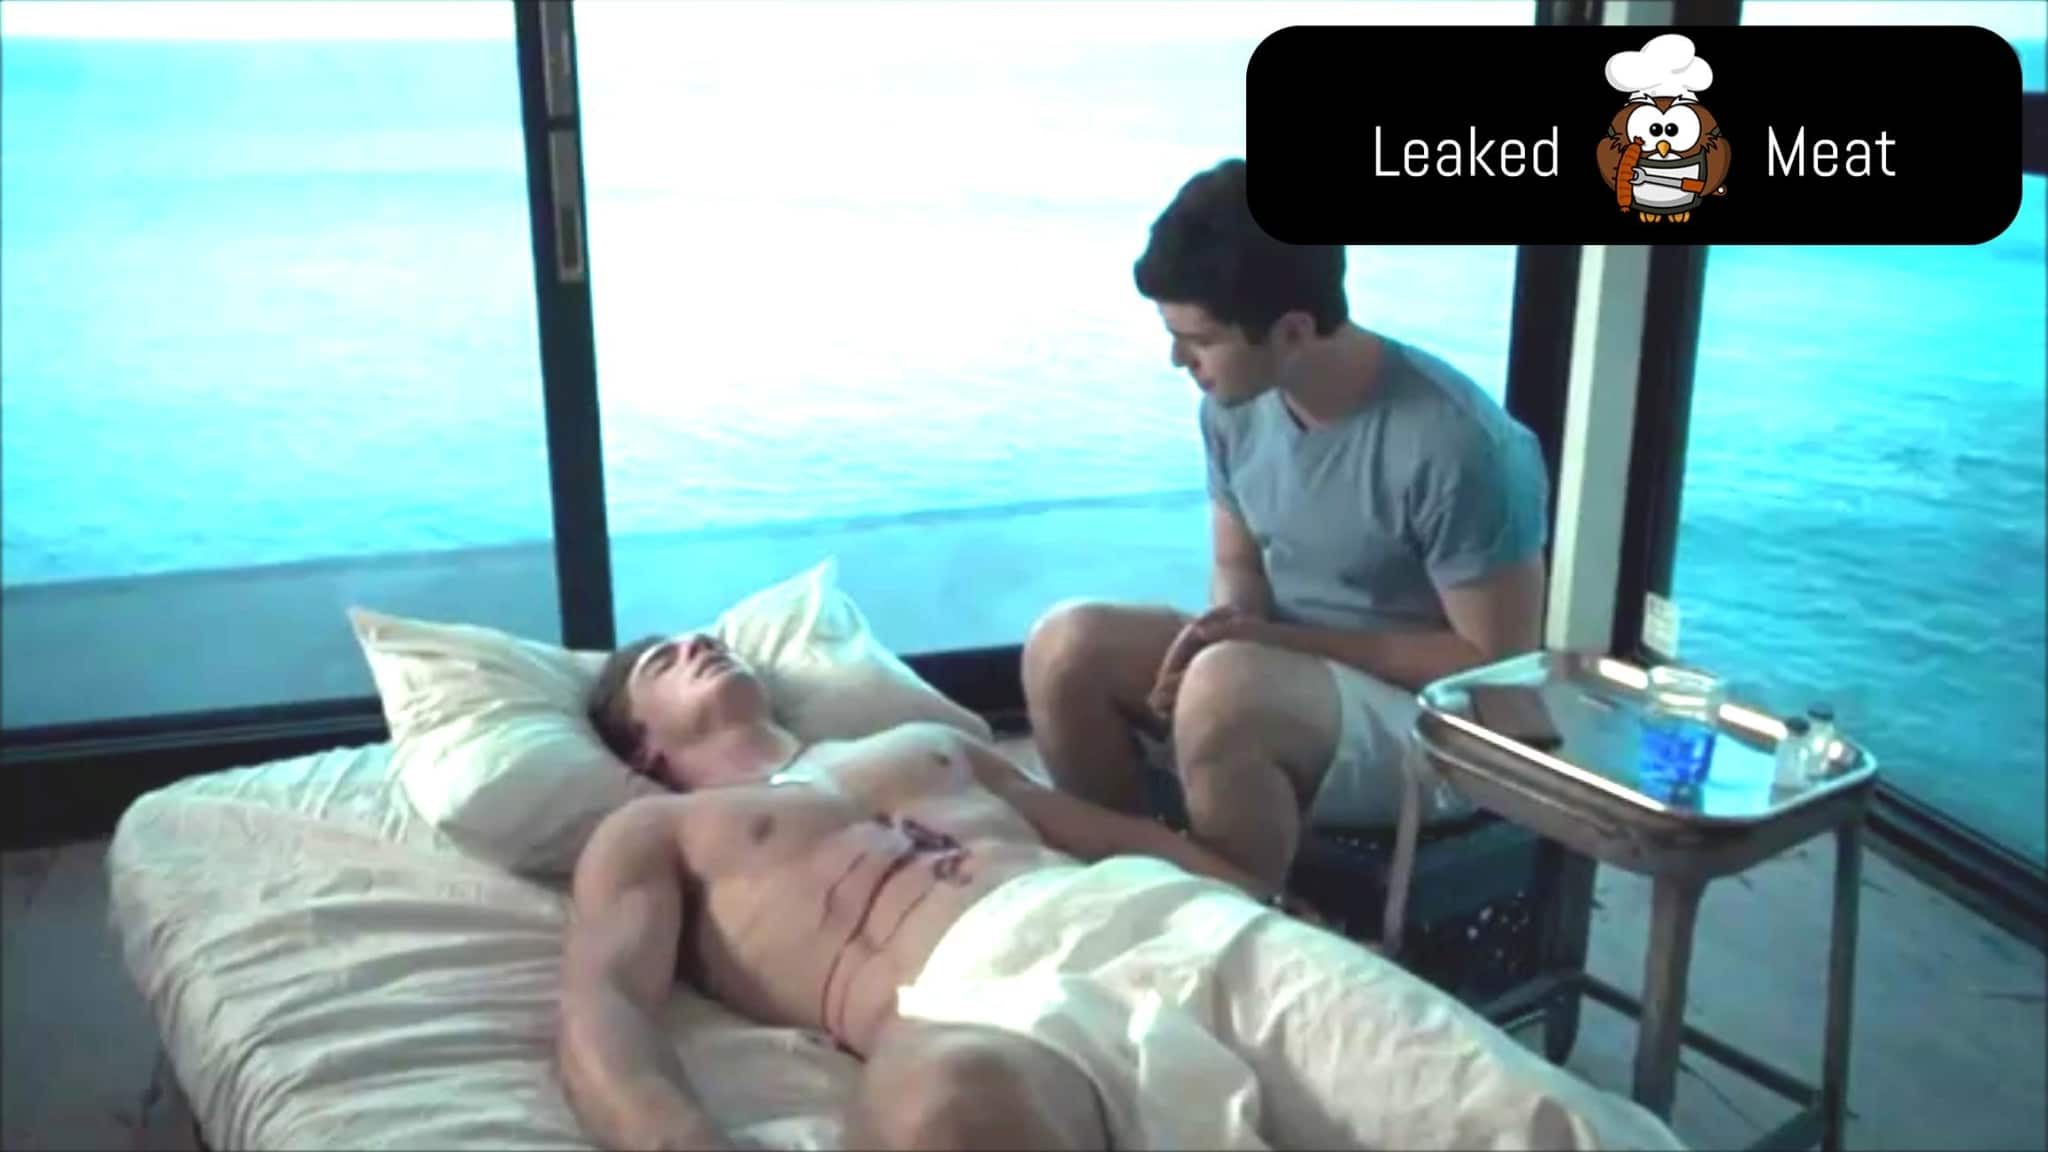 Spencer Neville | LeakedMeat 2